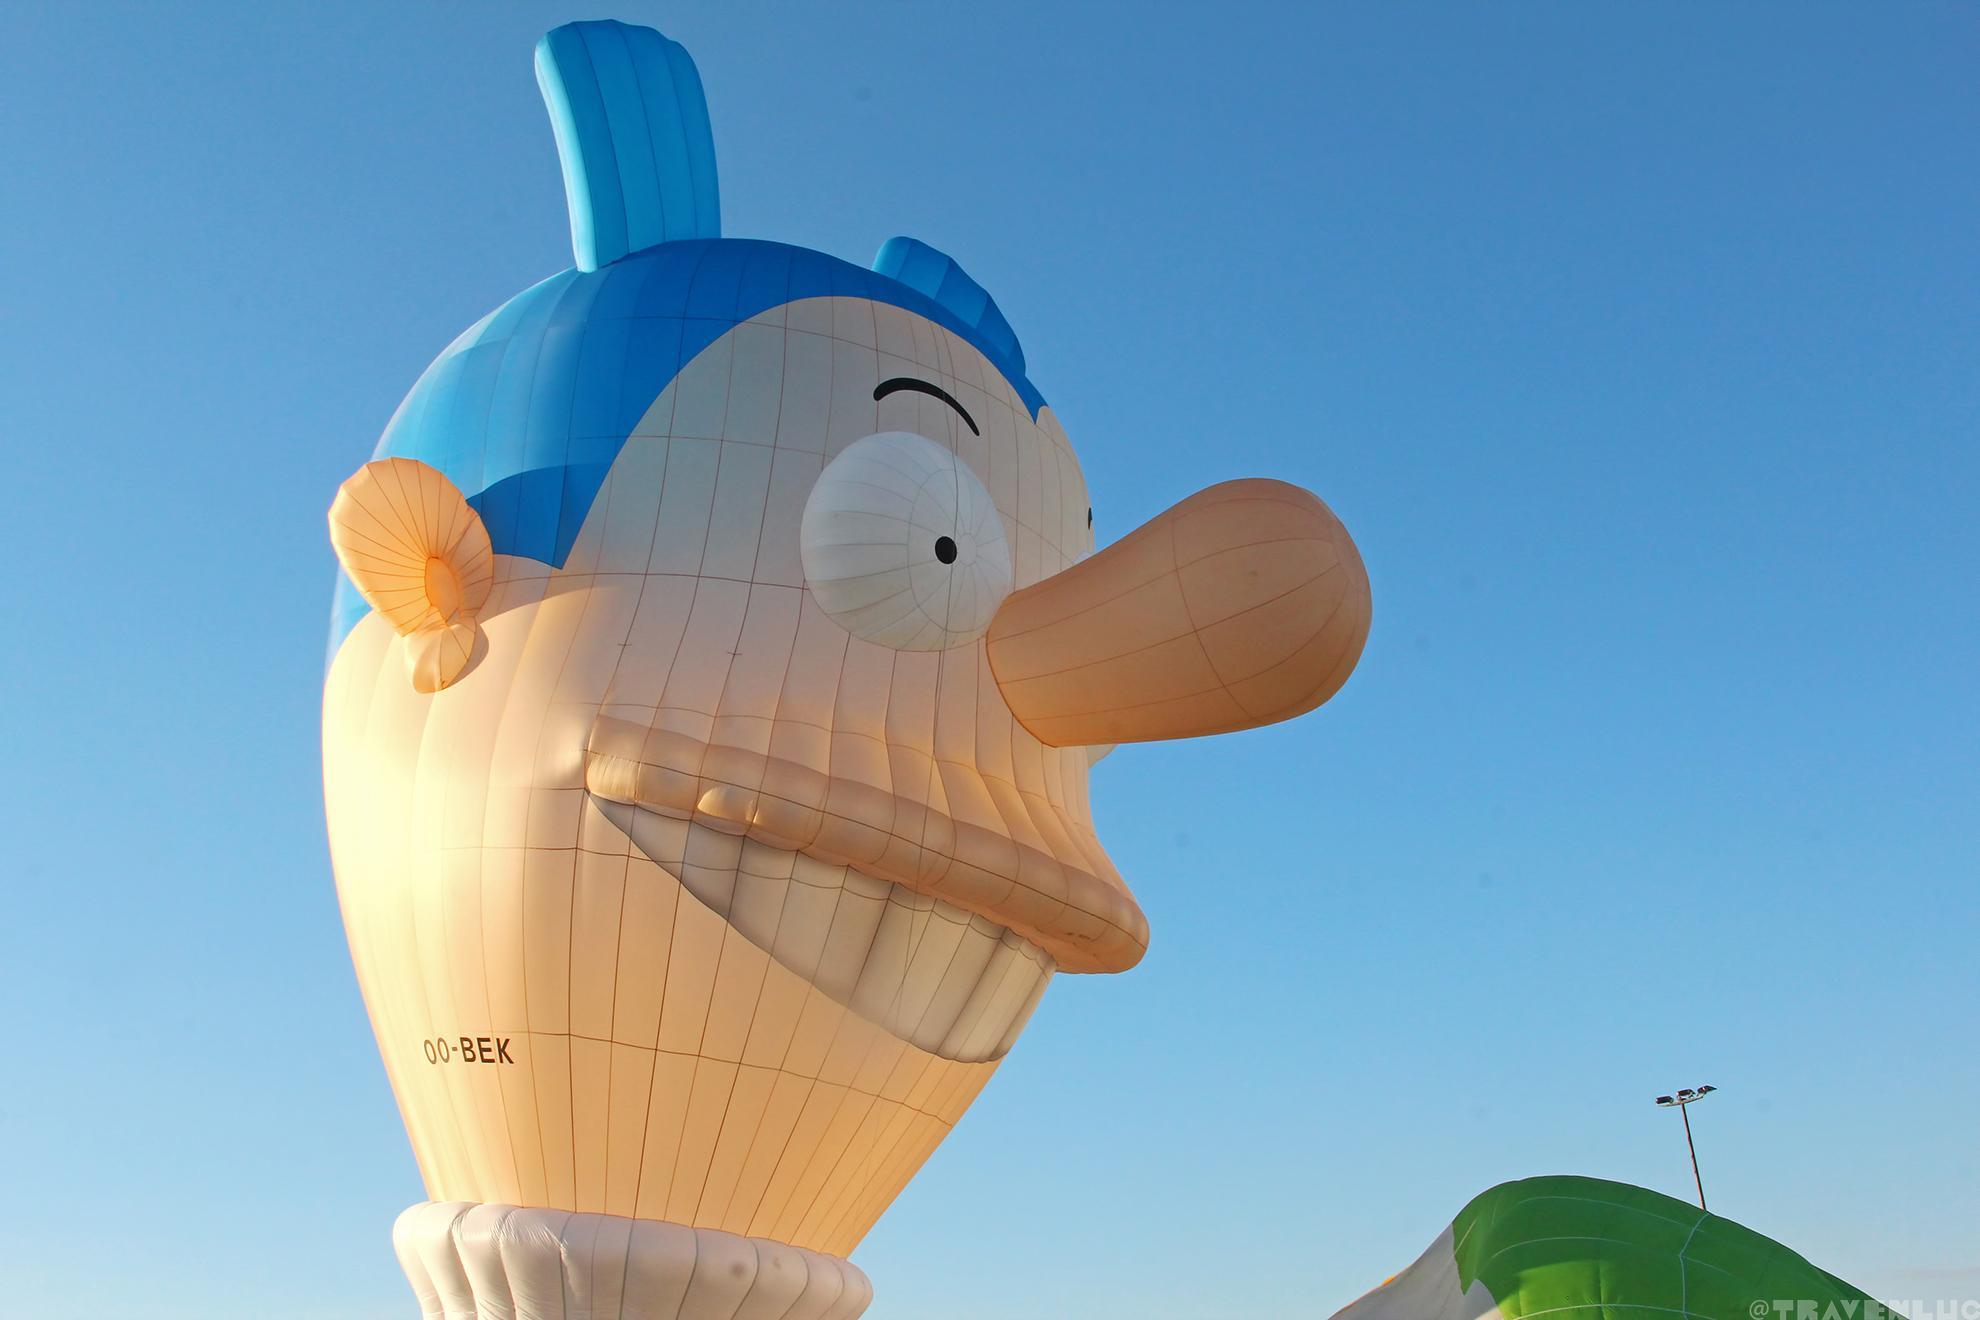 Eeklo Balloonmeeting Traven Luc